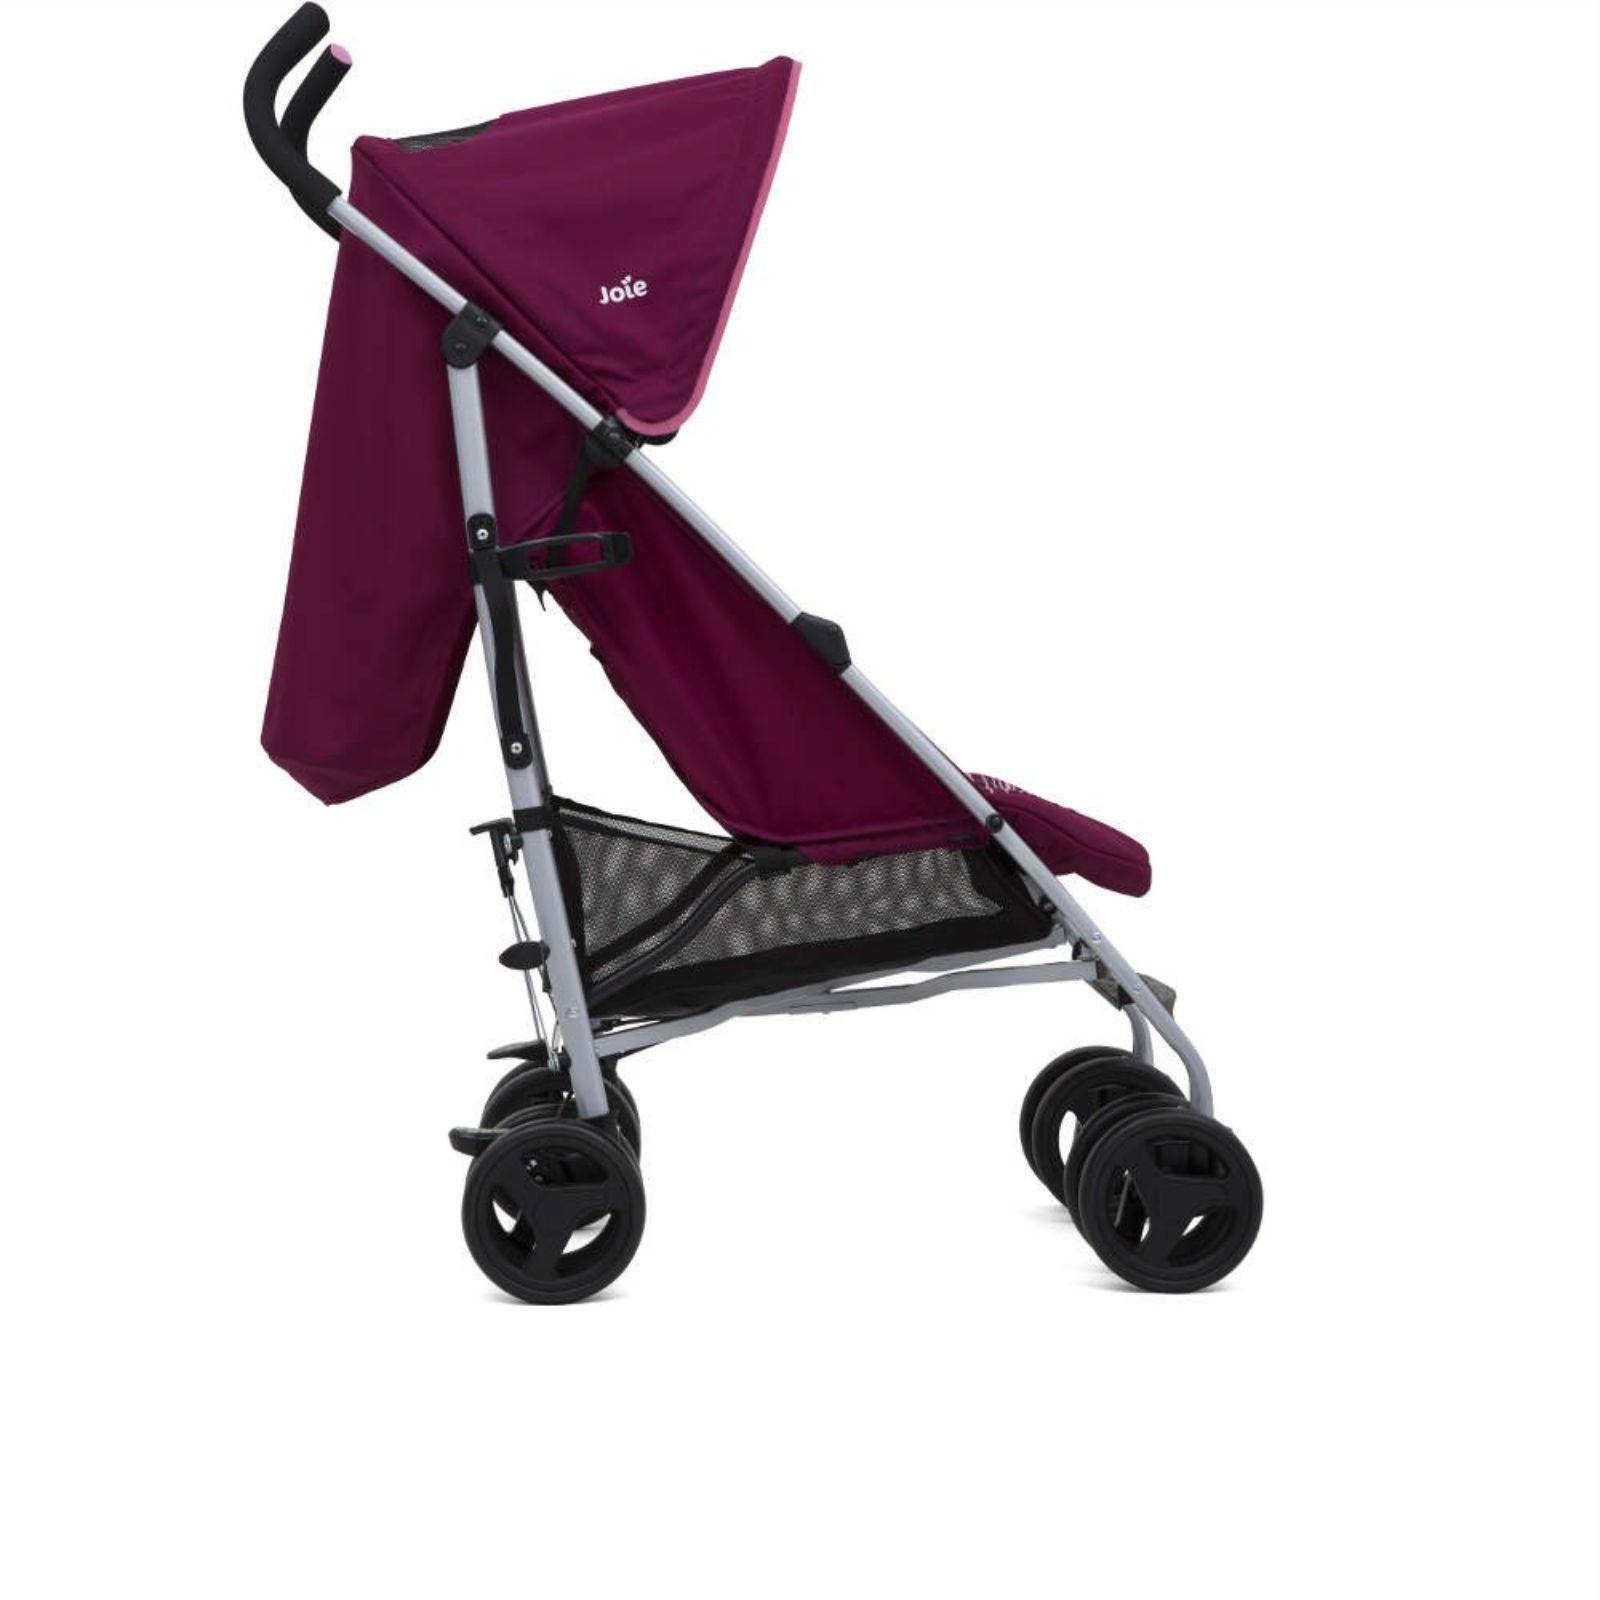 joie nitro pushchair stroller skewed lines pink buy at online4baby. Black Bedroom Furniture Sets. Home Design Ideas